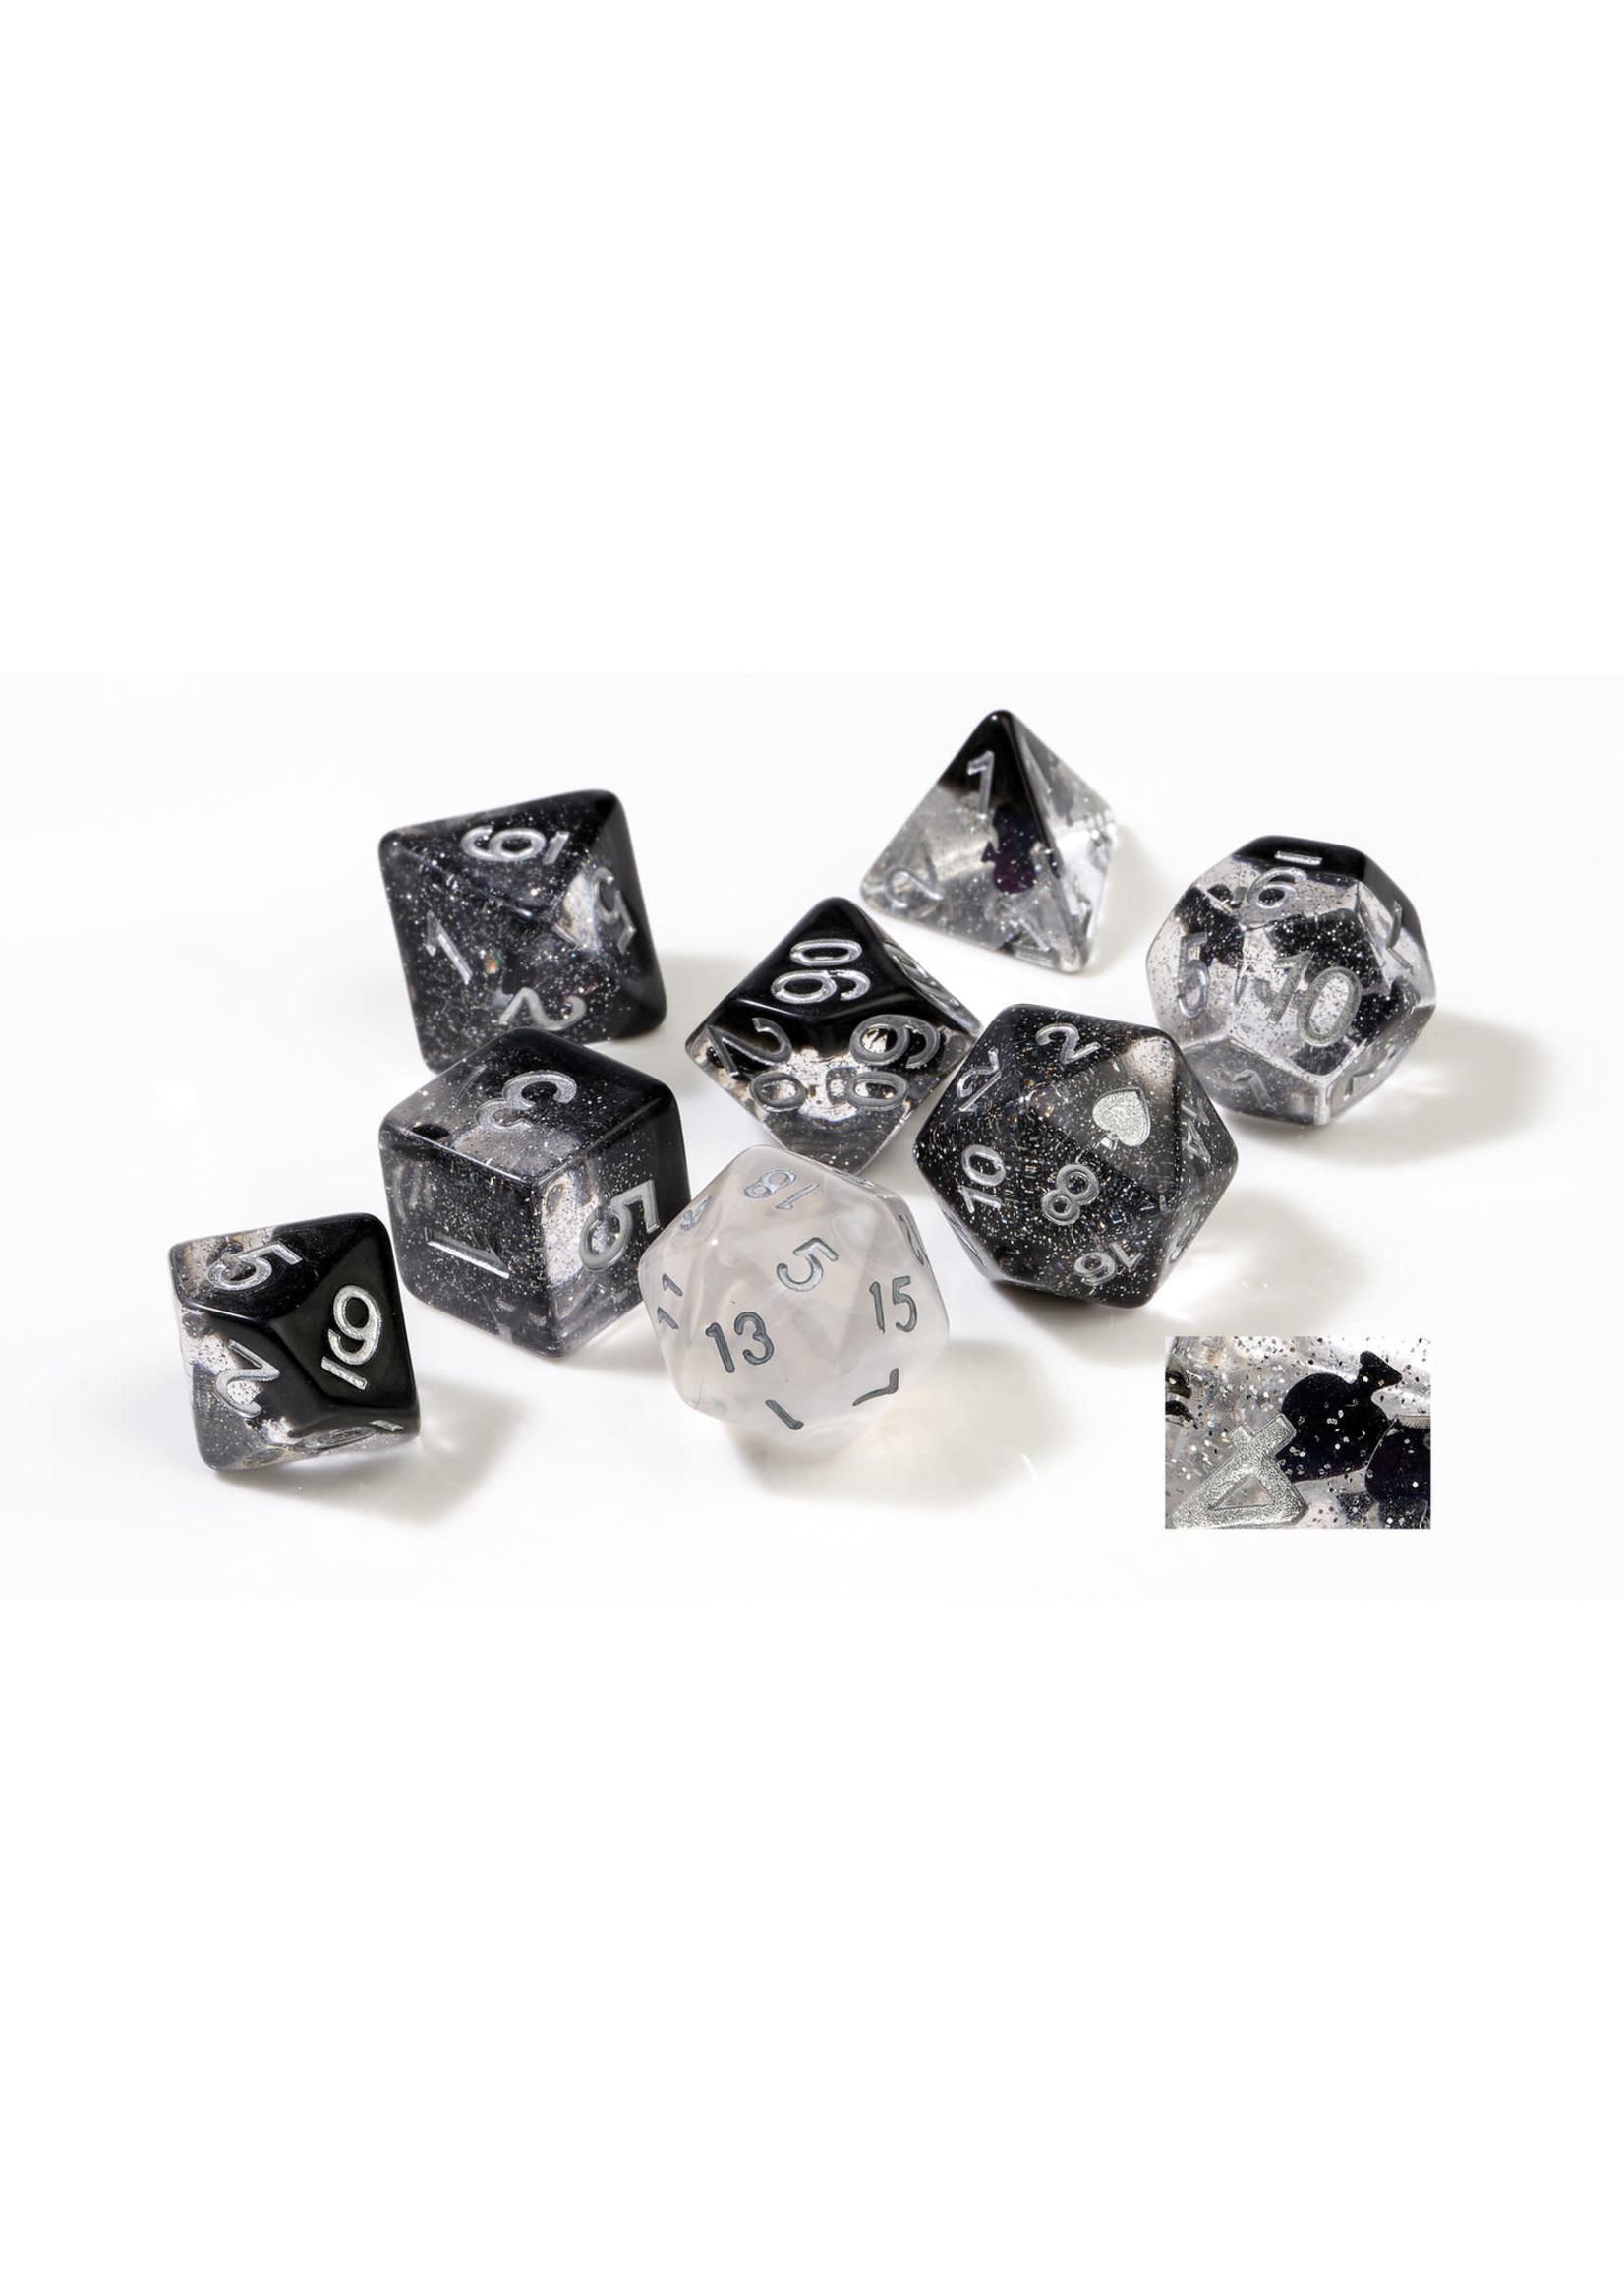 Sirius RPG Dice Set (7): Spades